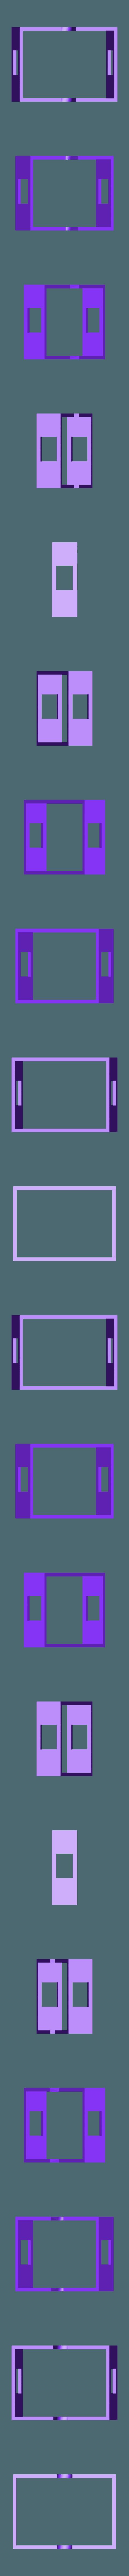 Retainer.stl Download free STL file T-Rex Windup Walker • 3D printer model, gzumwalt